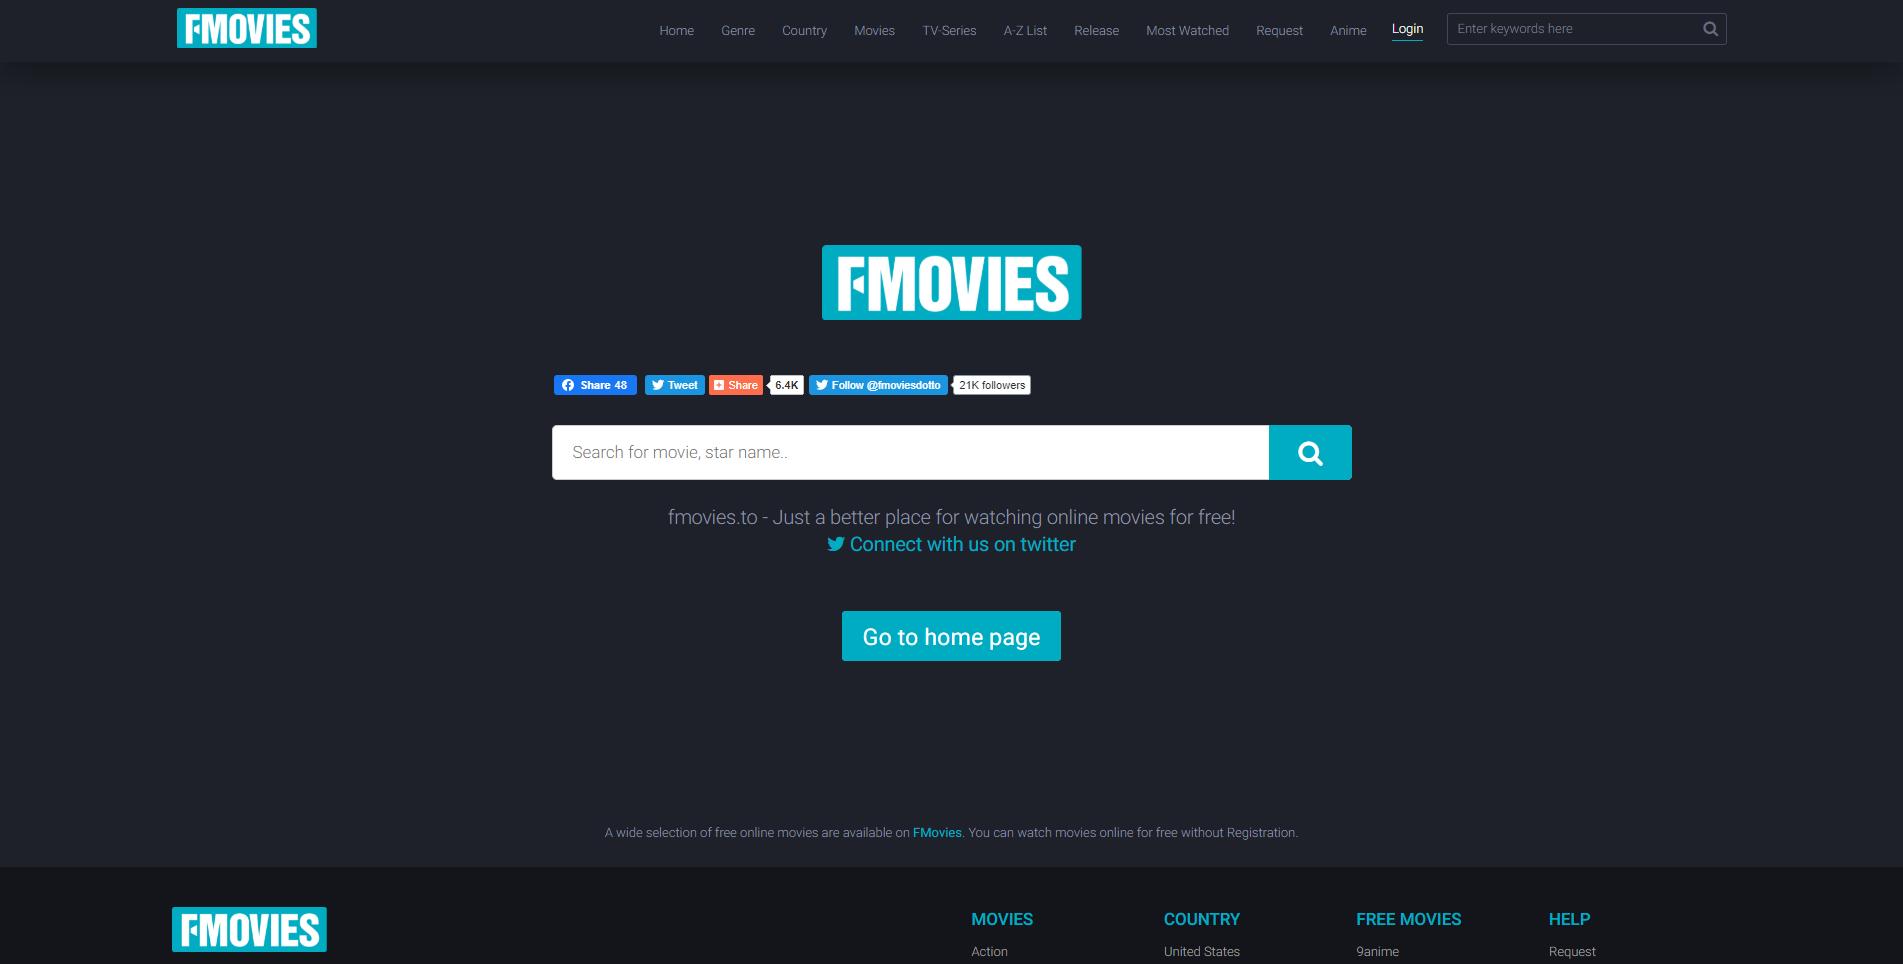 fmovies homepage